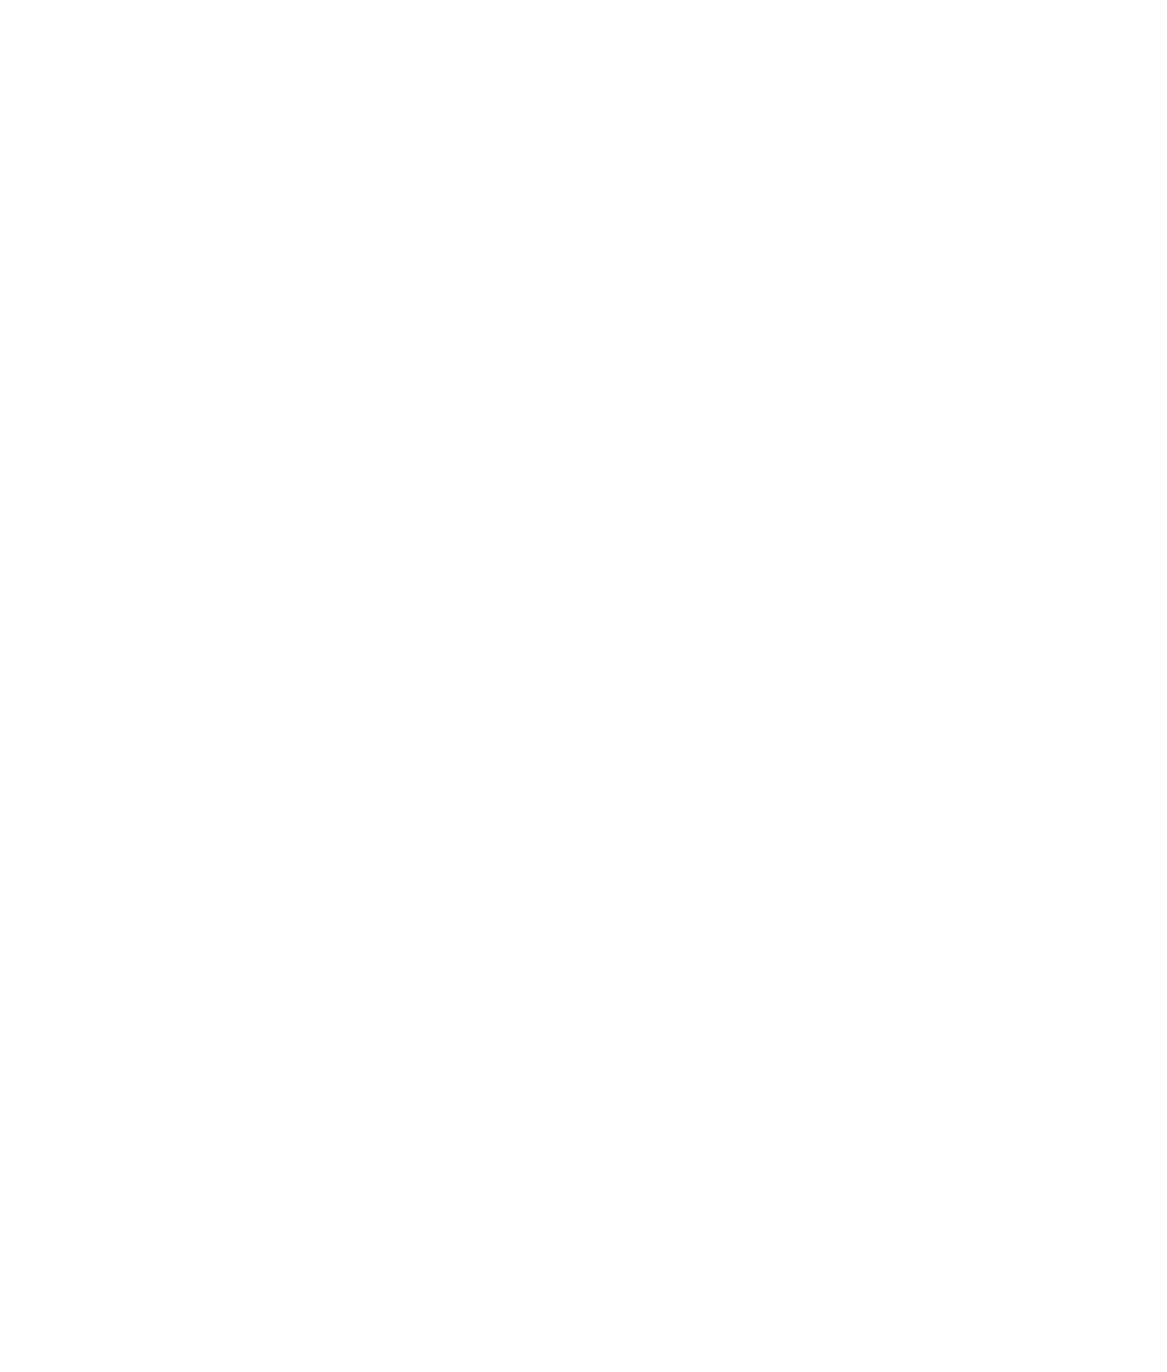 Cerule Summit 2017